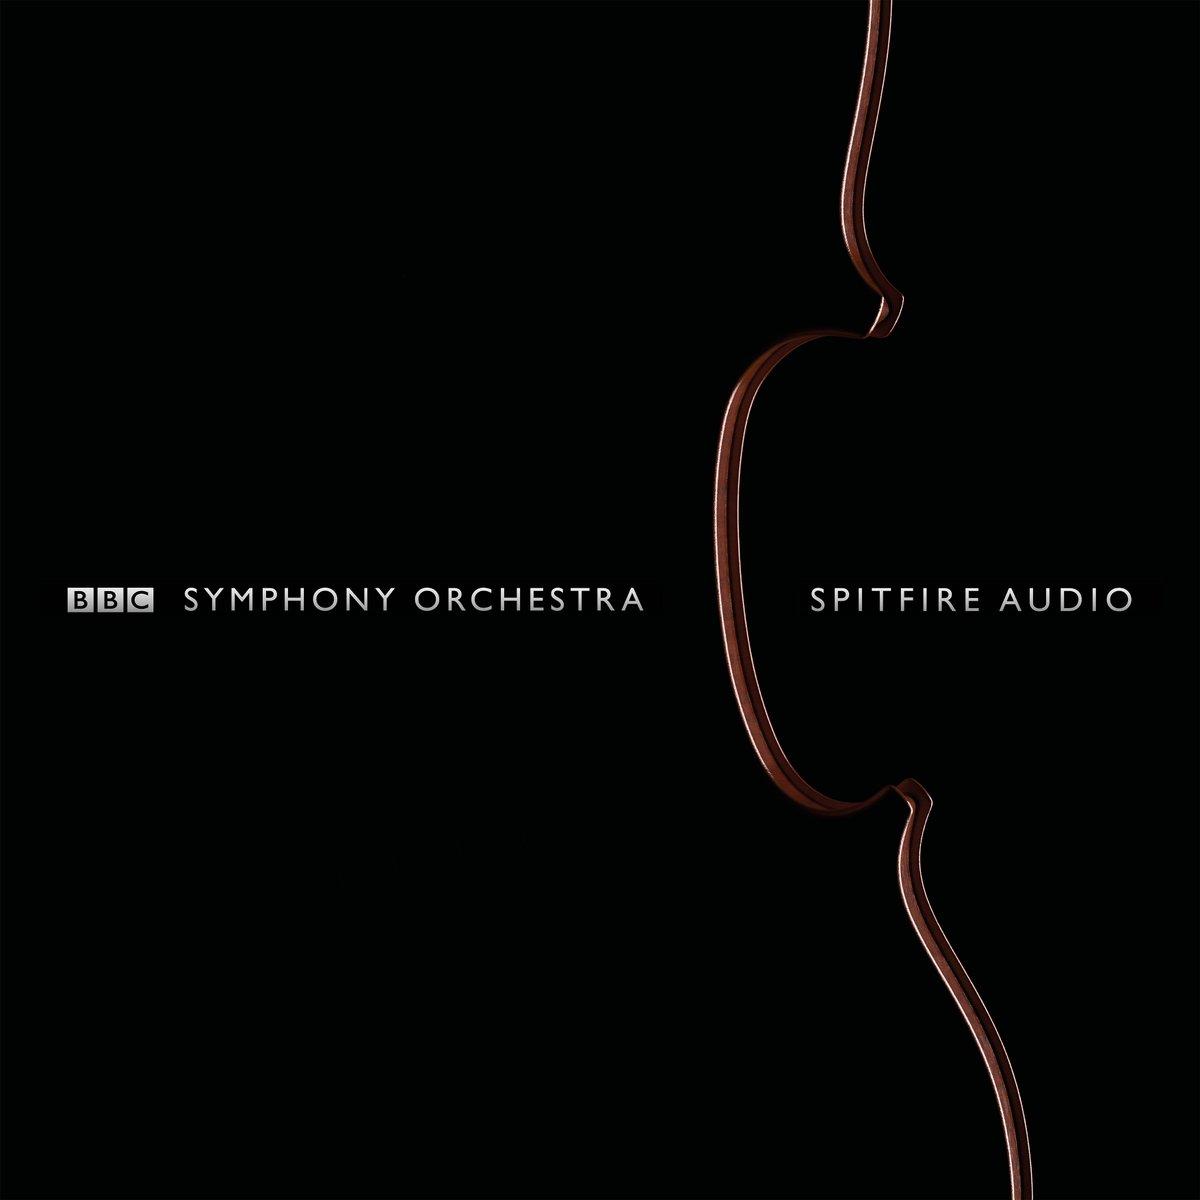 Spitfire Audio (@SpitfireAudio) | Twitter